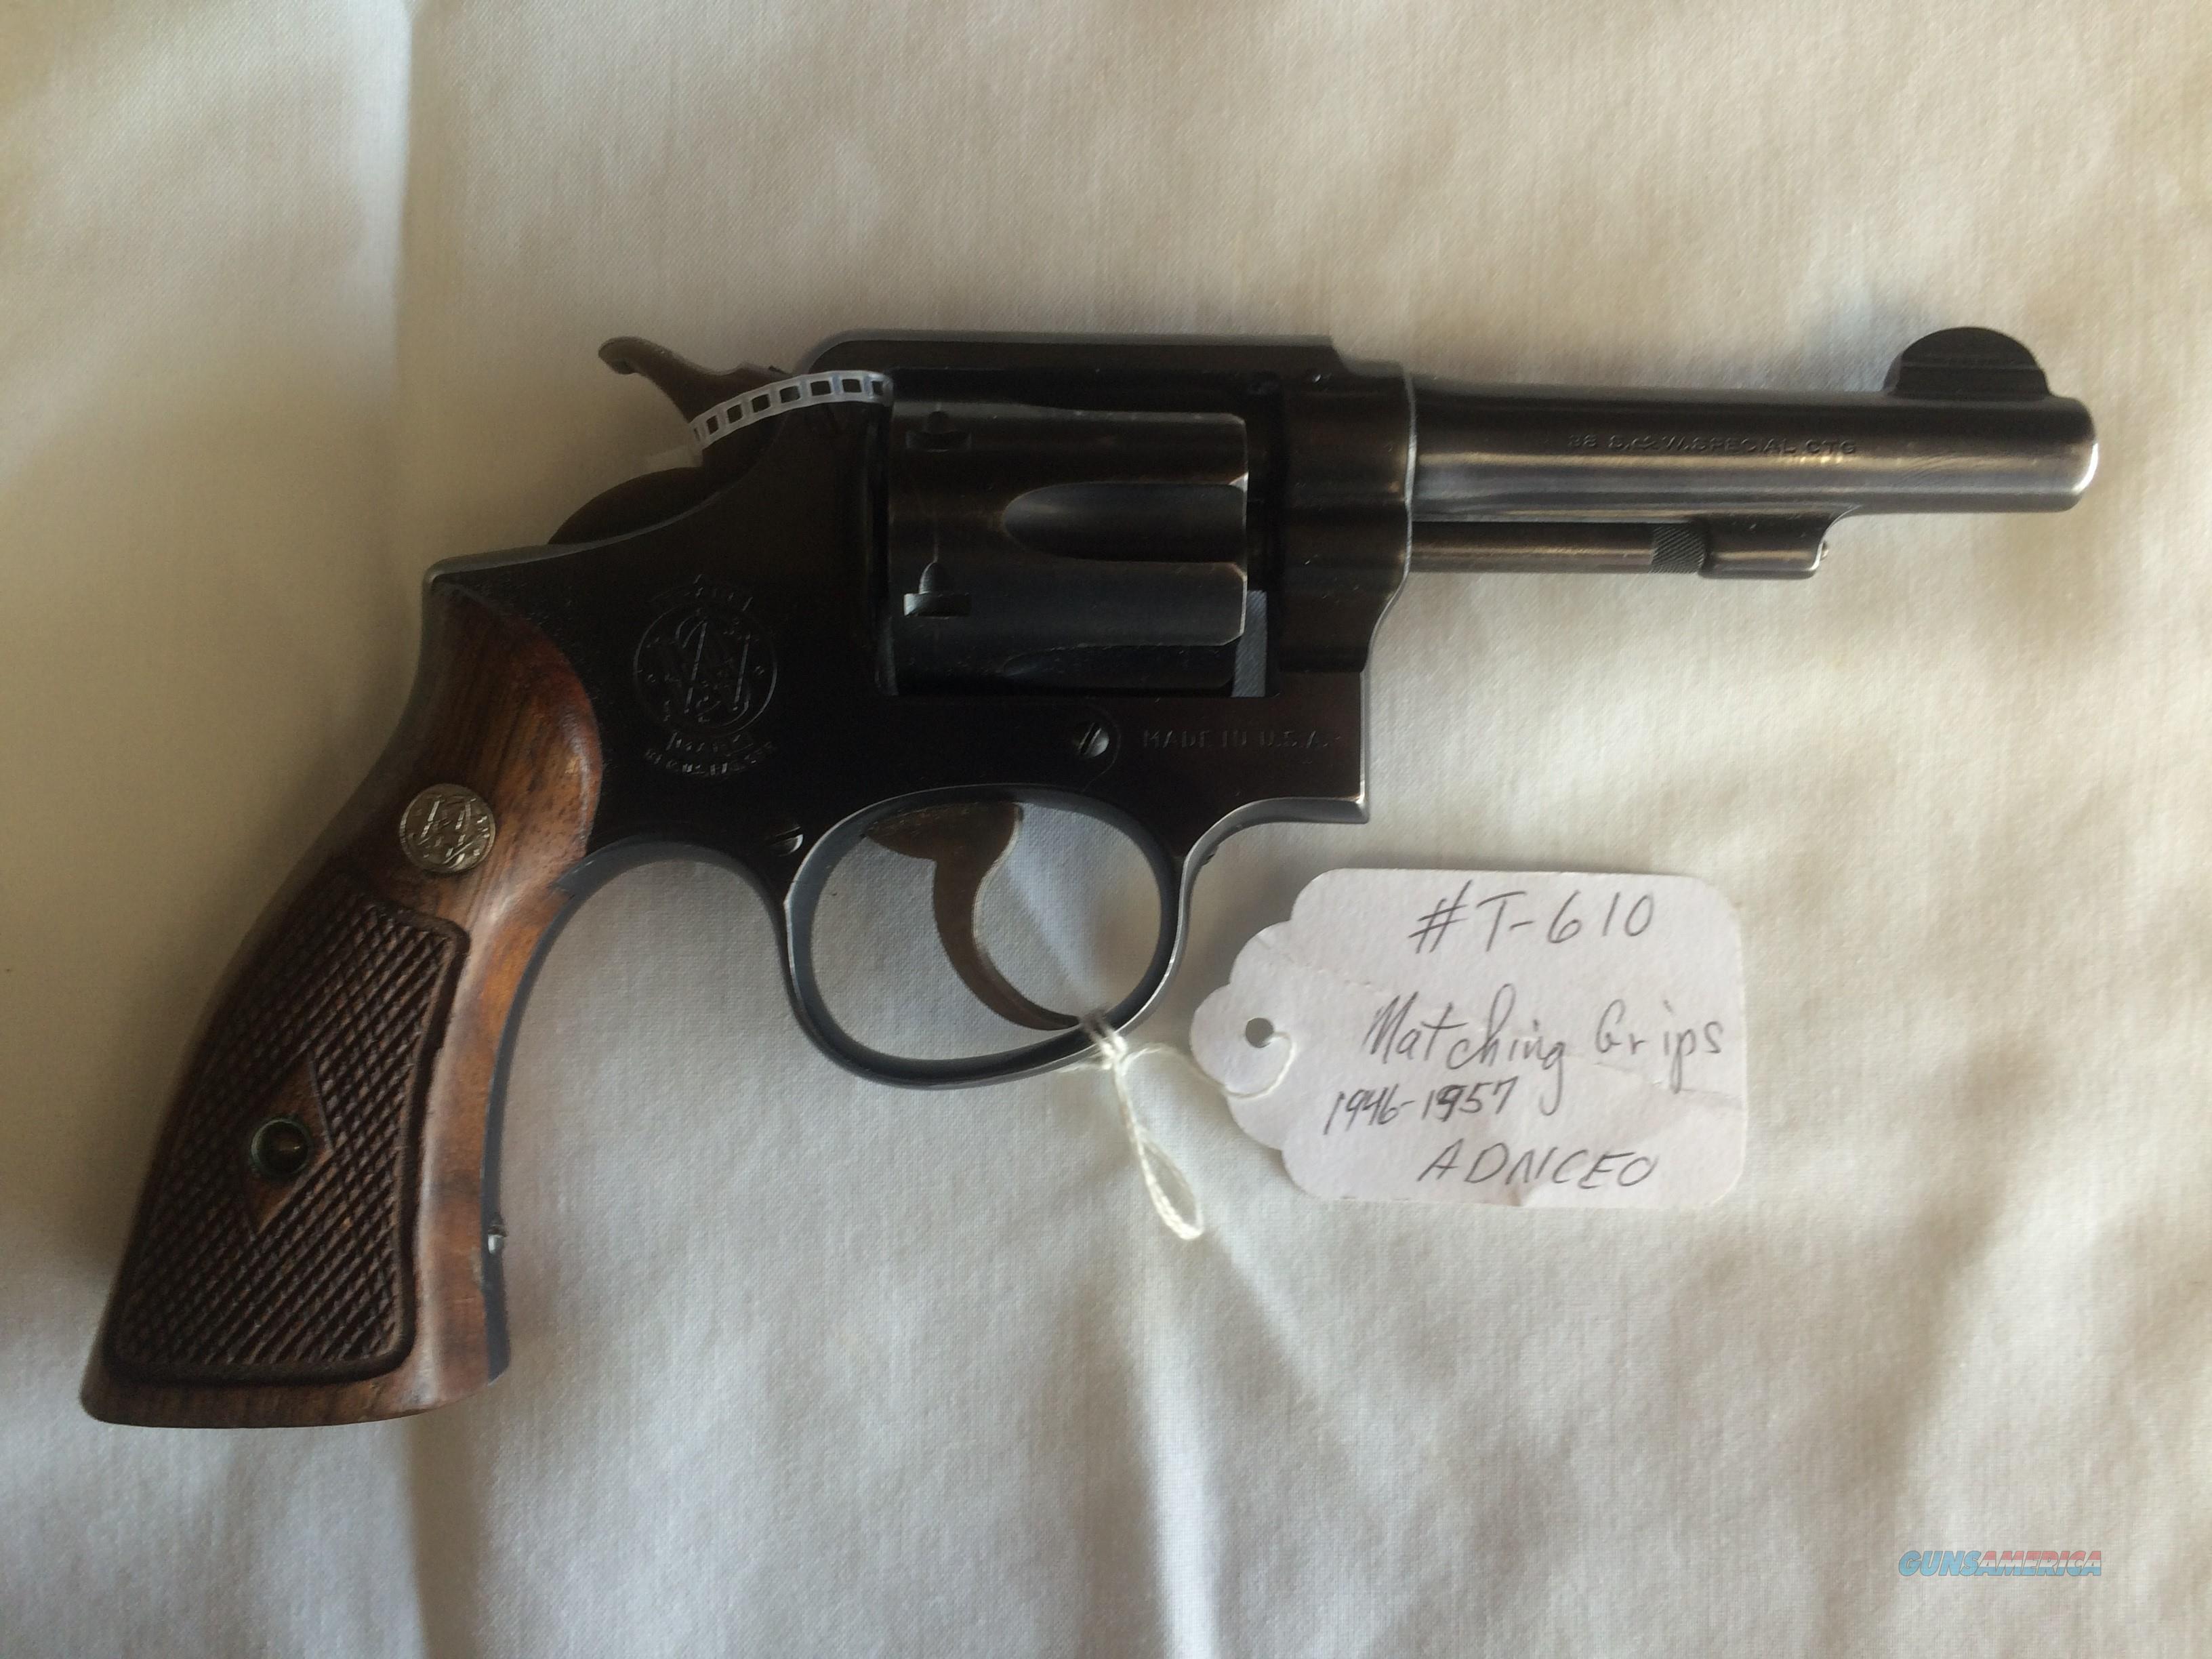 SMITH & WESSON PRE MODEL 10 .38 SPECIAL REVOLVER  Guns > Pistols > Smith & Wesson Revolvers > Model 10